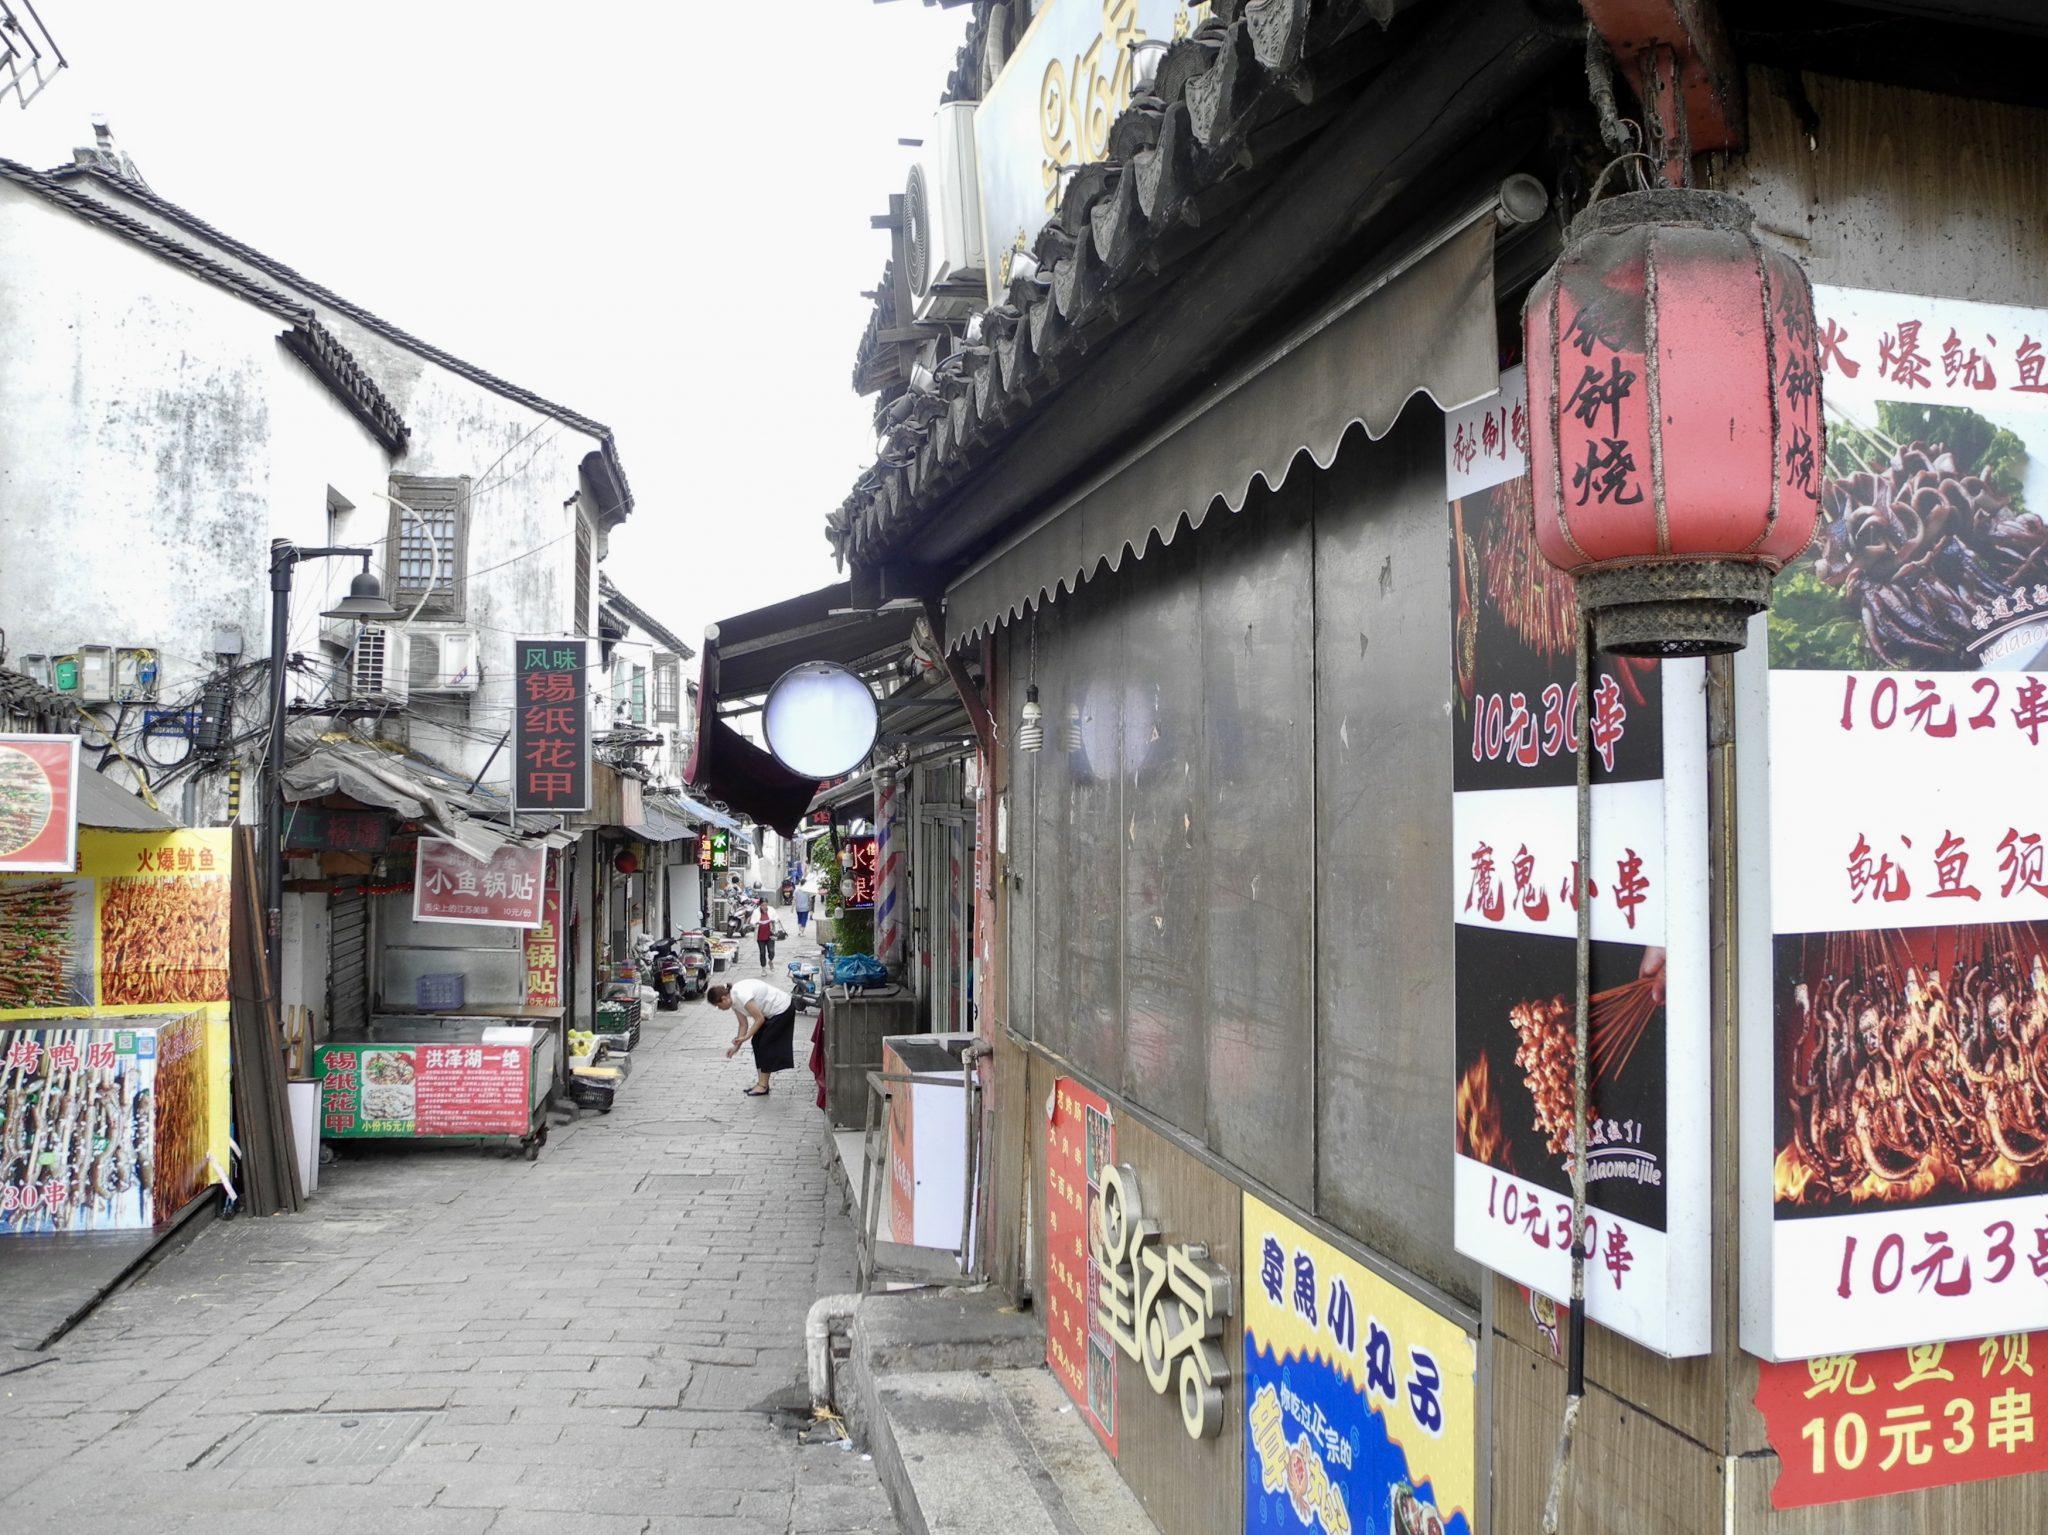 Mudu Ancient Town China